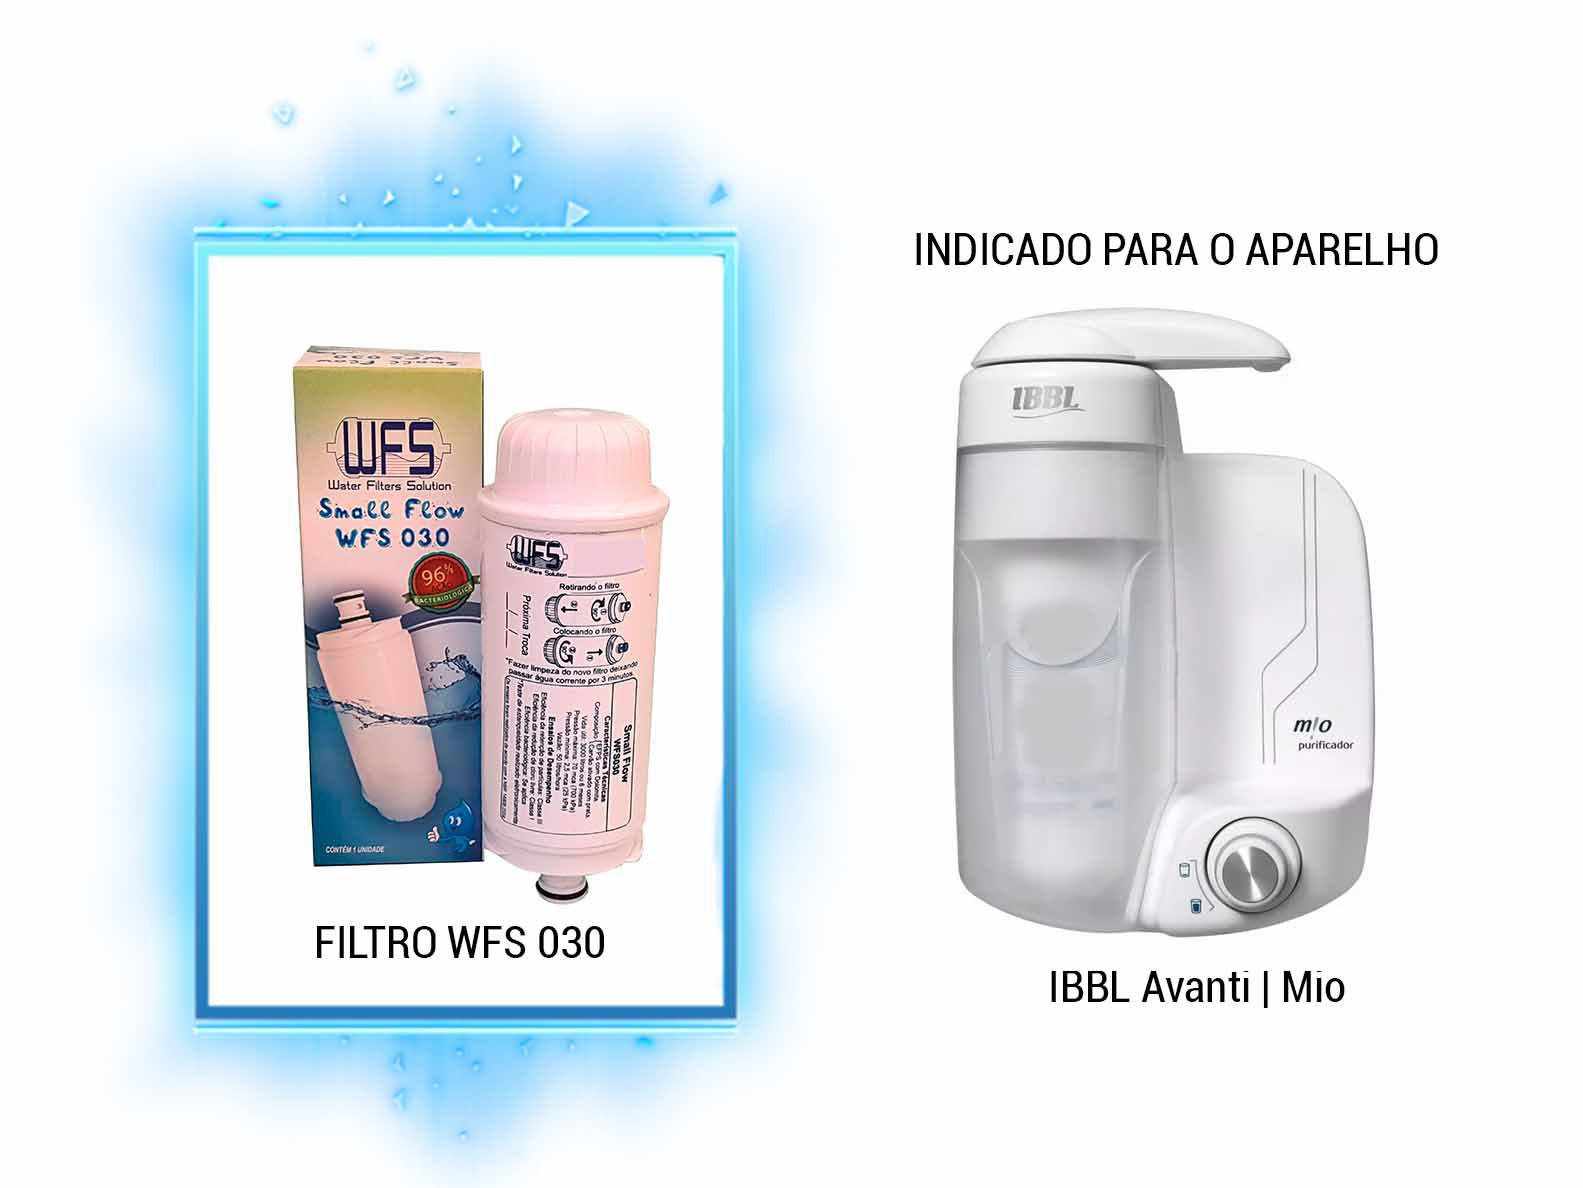 FILTRO BEBEDOURO (SMALL FLOW) IBBL/AVANTI/MIO Refil Purificador IBBL / AVANT / MIO   Wfs 030   Small Flow